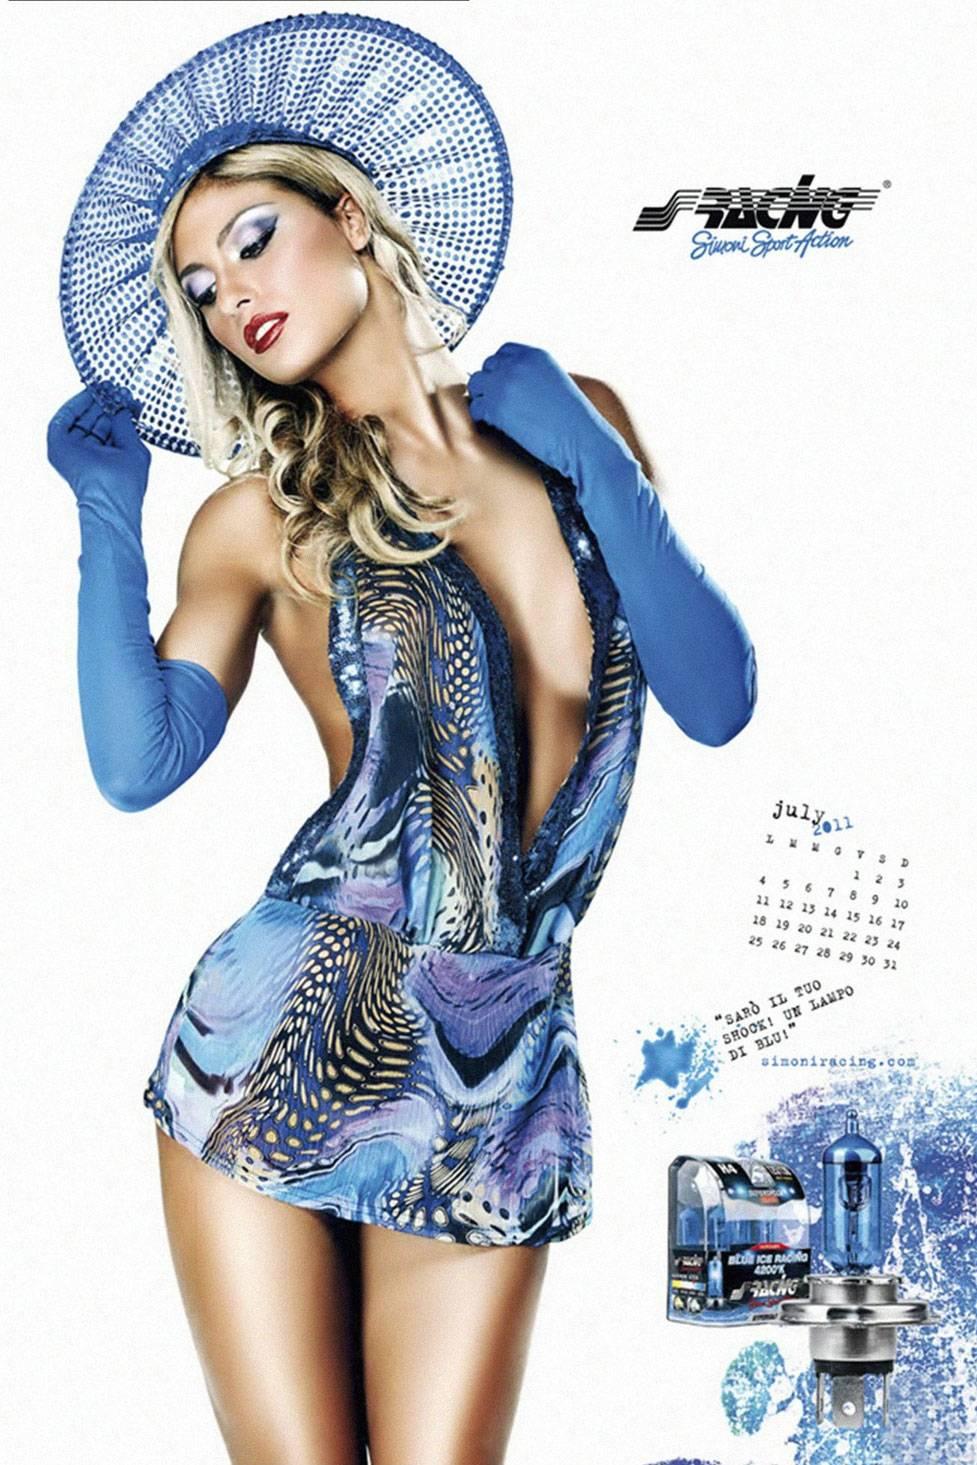 Giada Bellodi for Simoni Racing calendar 2011